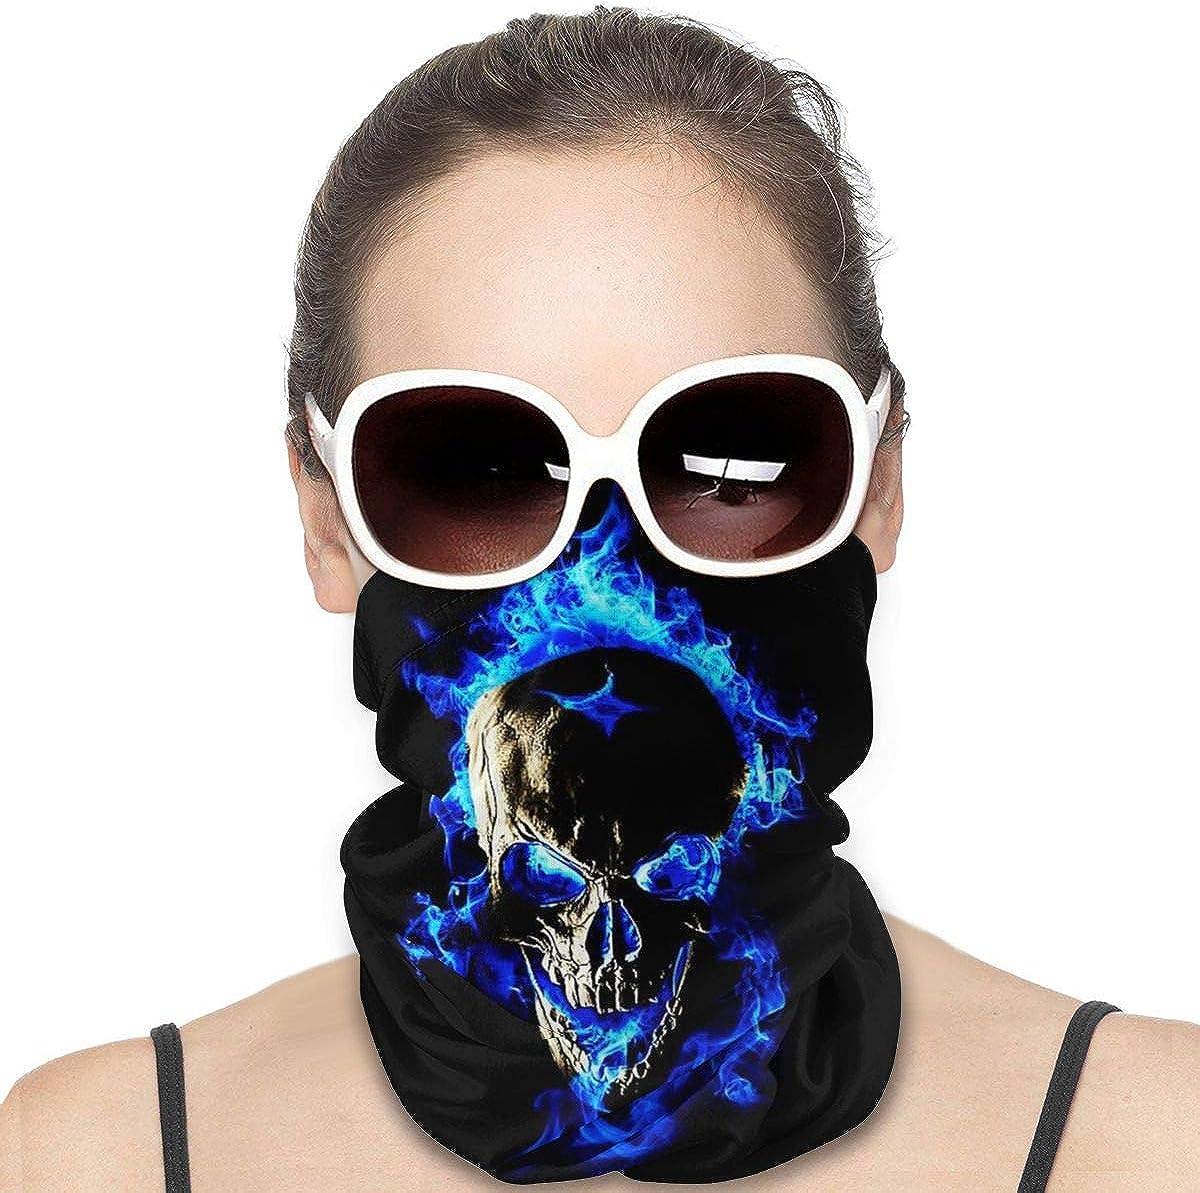 JinSPef Bandana Face Mask - Blue Flame Skull Fire Motorcycle Mask Neck Gaiter Face Scarf Head Bands Neck Warmer Men Headbands Sun Mask